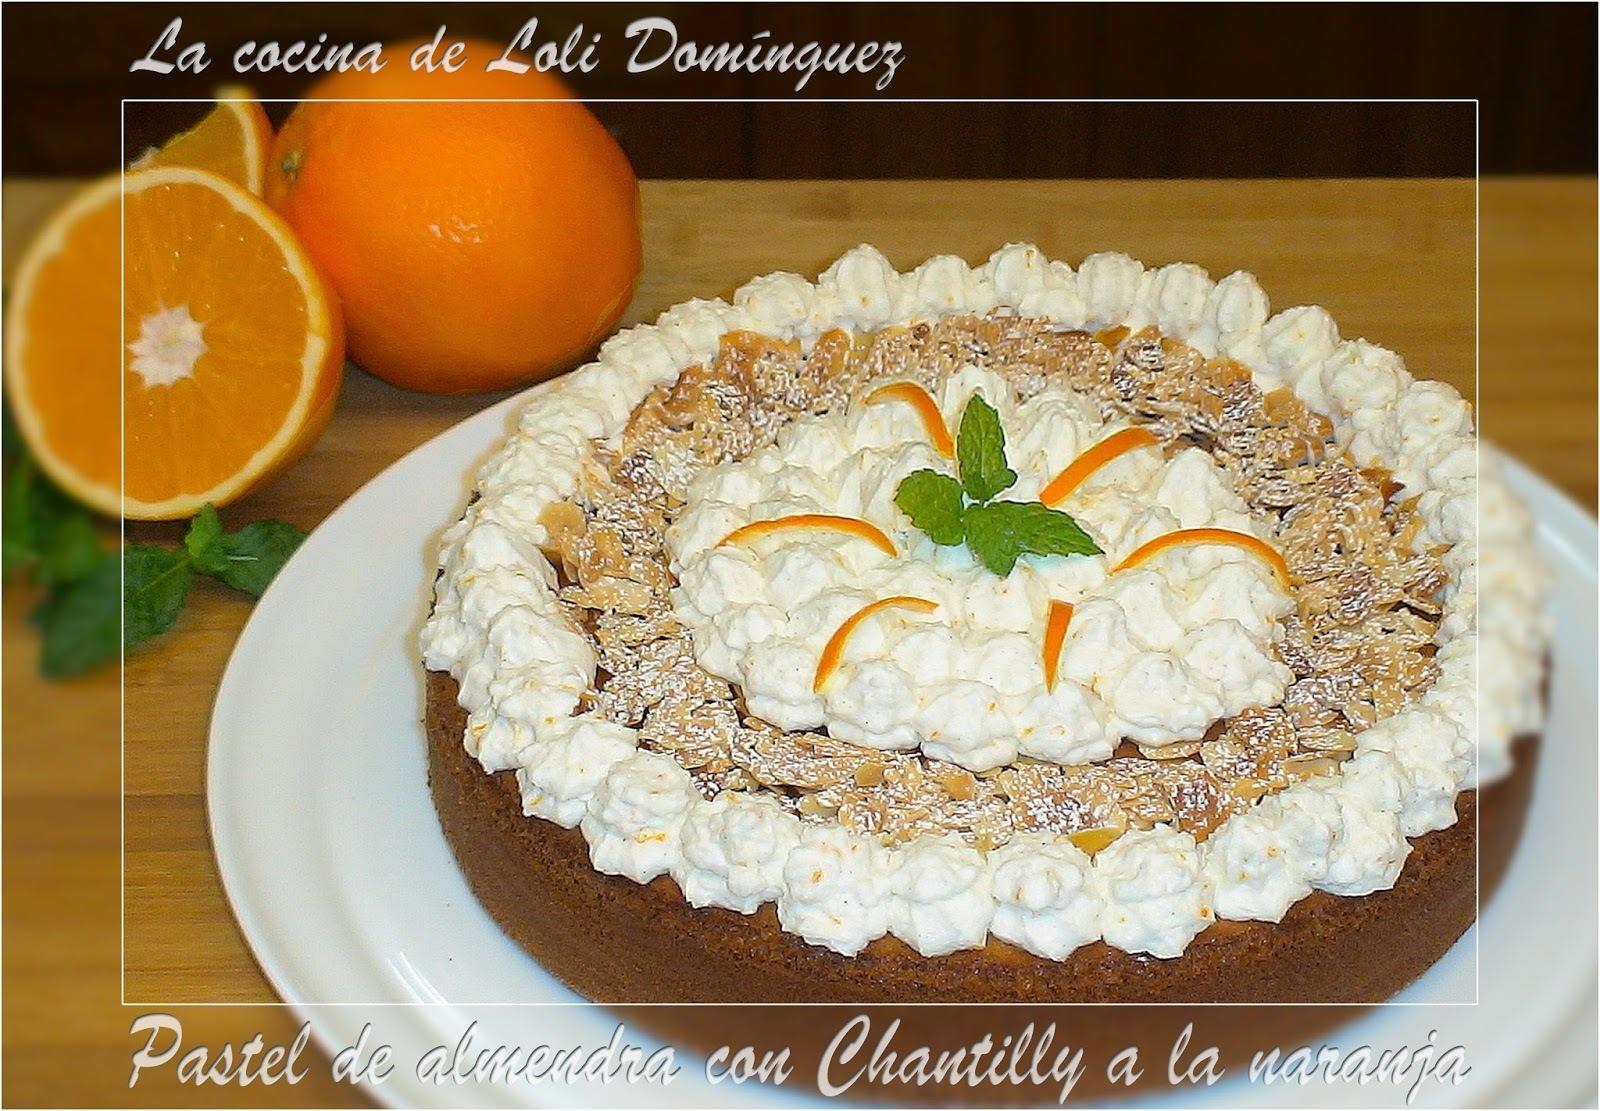 Pastel de almendra con Chantilly a la naranja